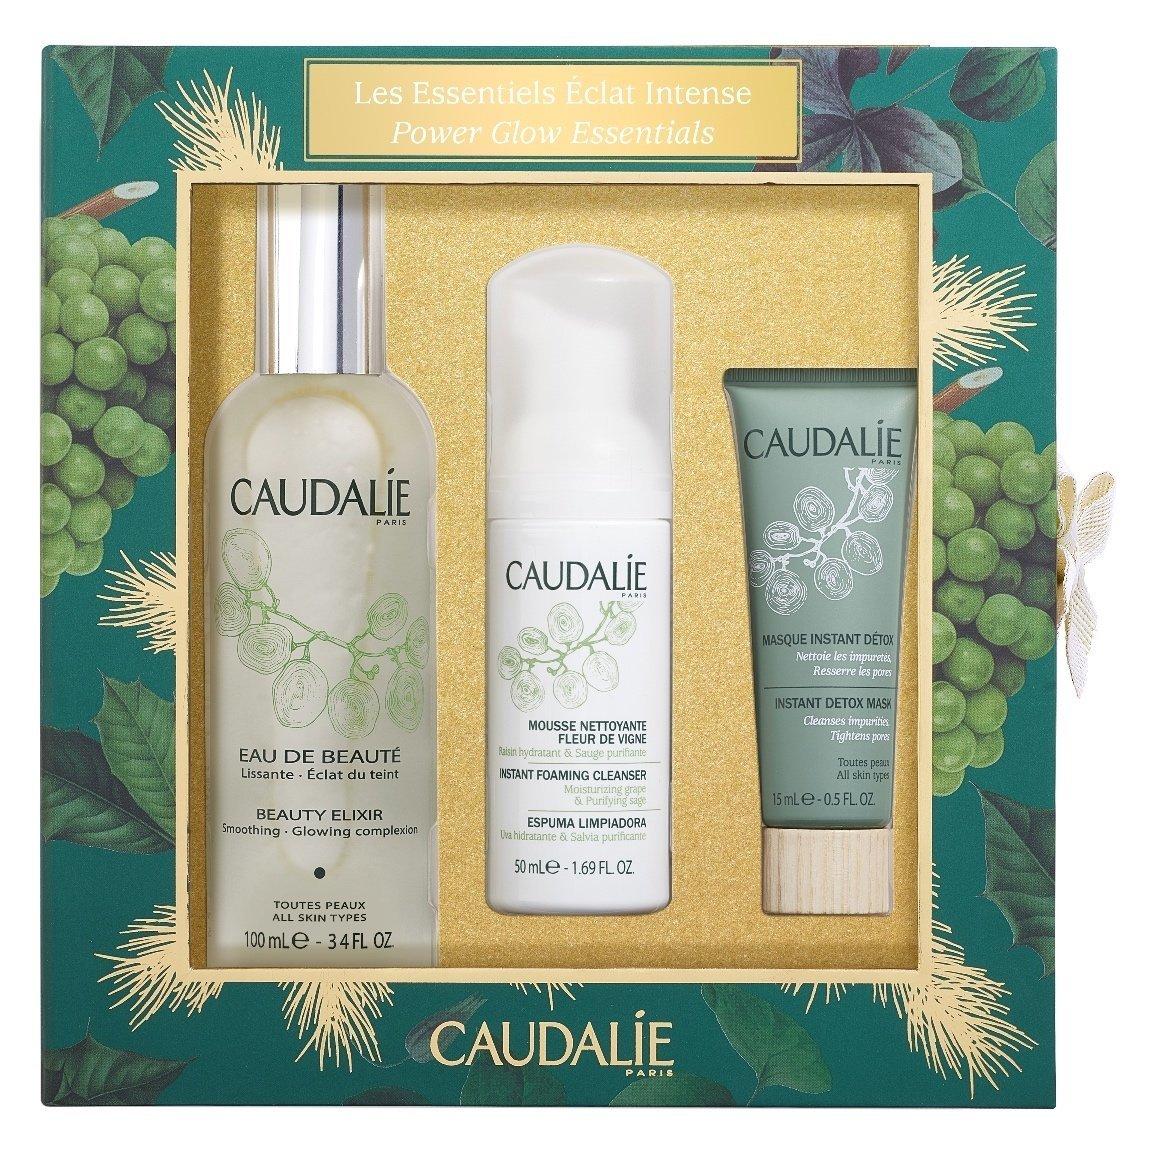 Caudalie Beauty Elixir Power Glow Essentials Set product swatch.